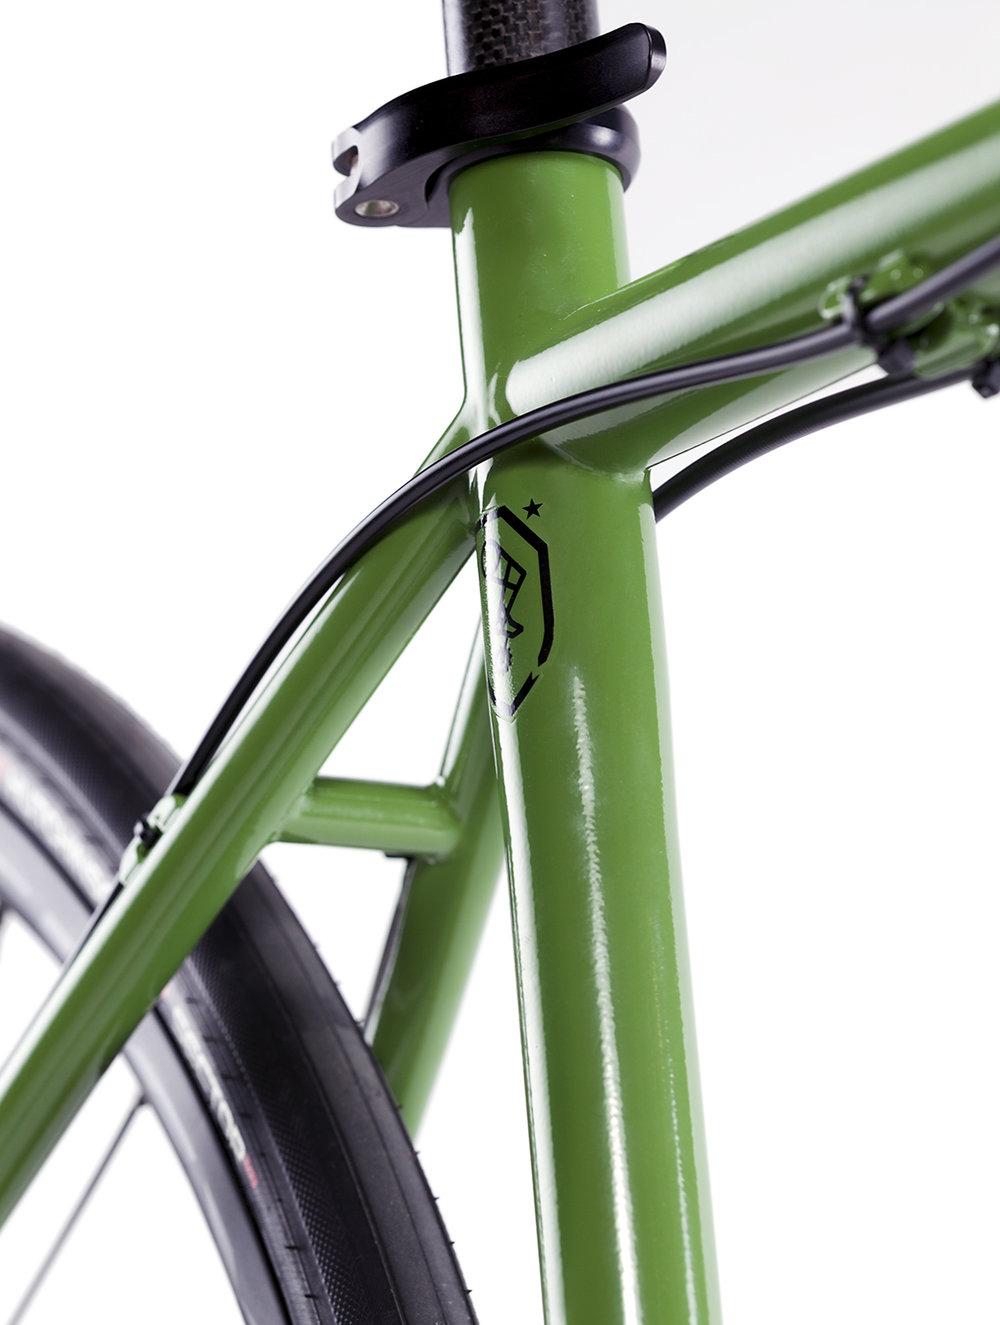 6-17_Proudfoot_Roadbike_Detail2_Web.jpg